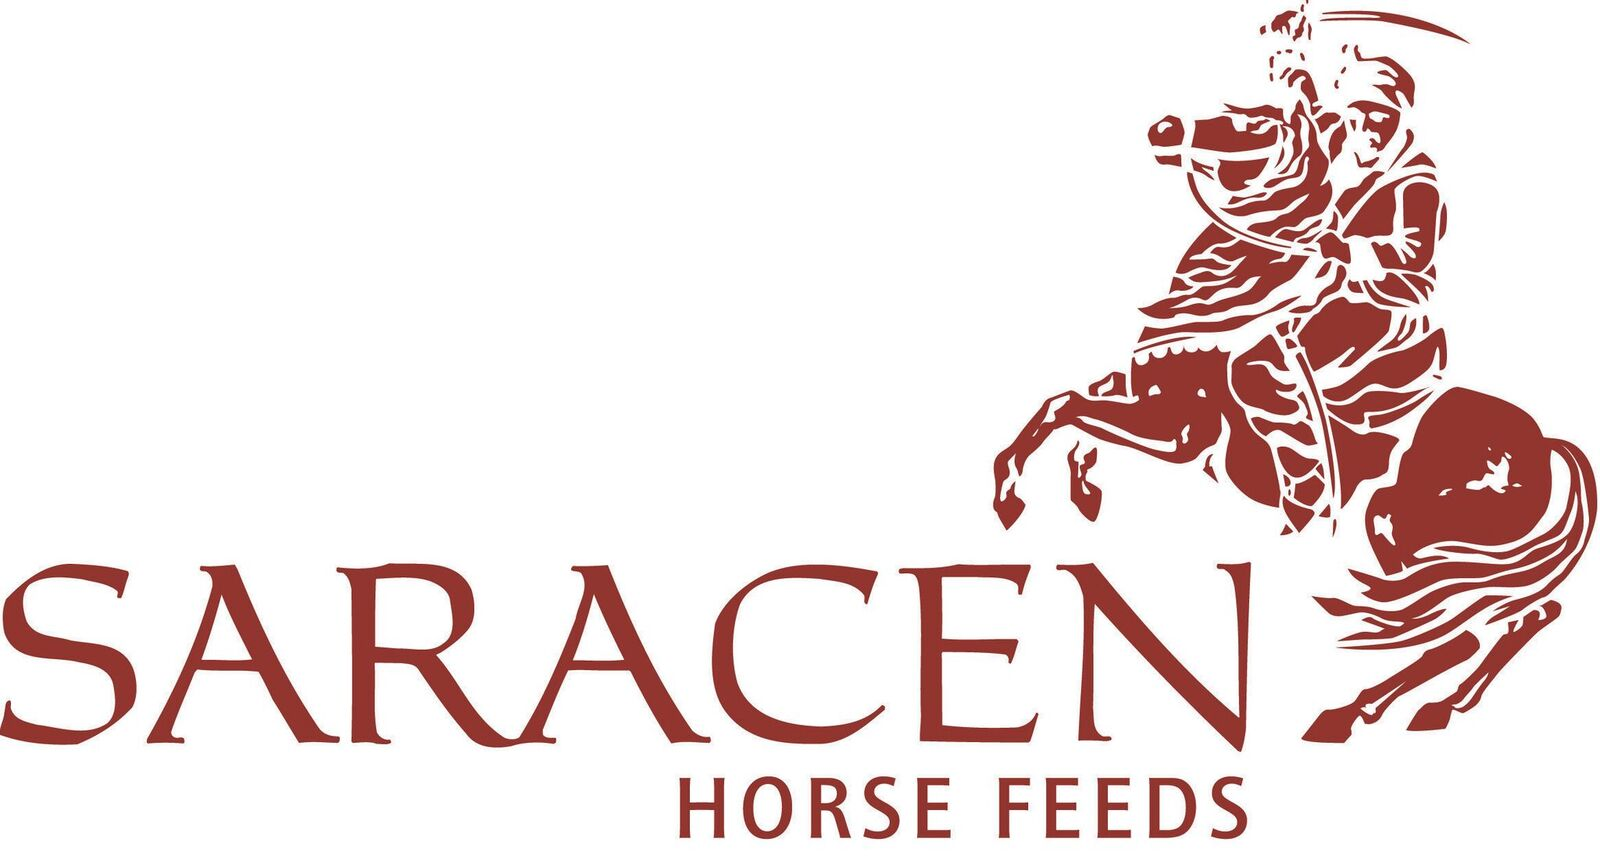 Saracen horse feed